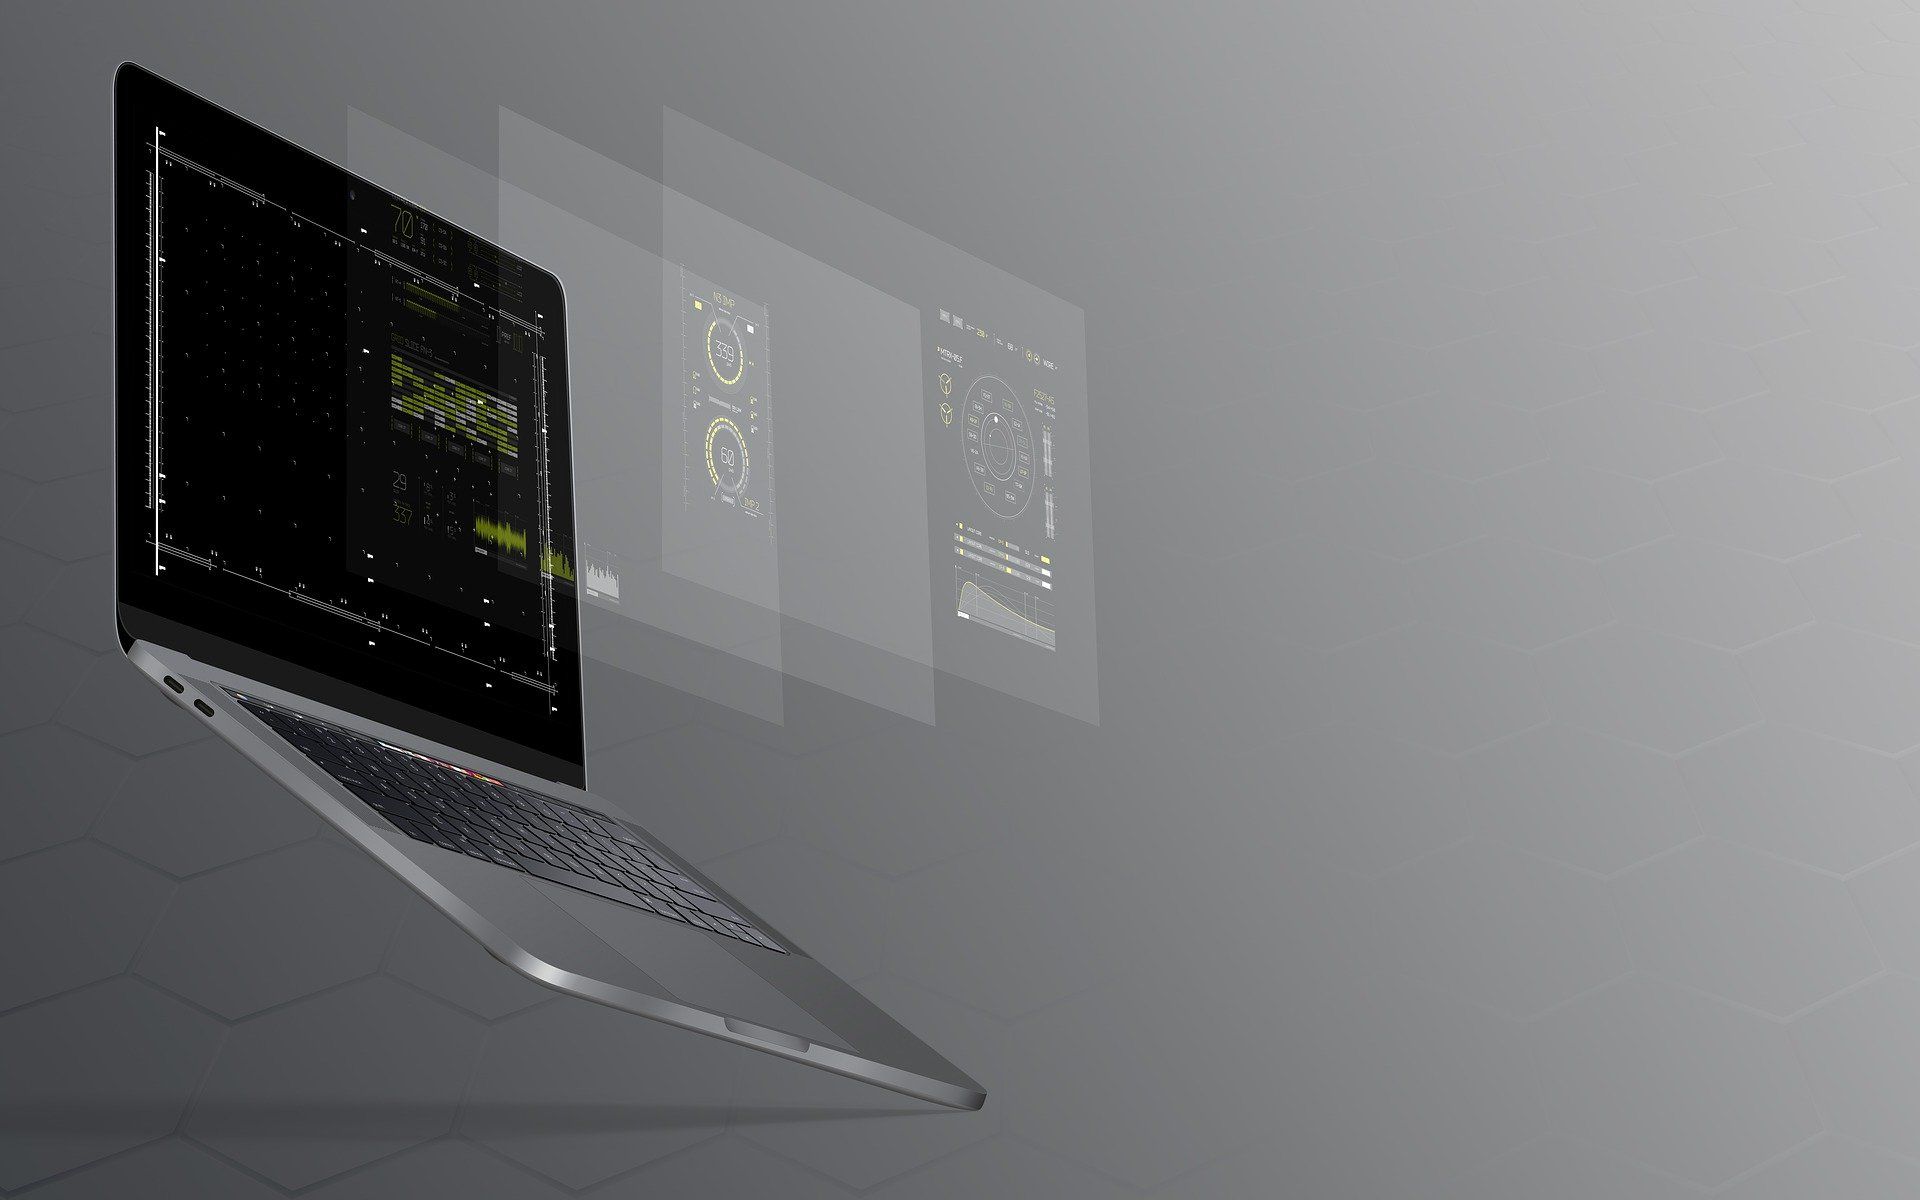 laptop-3174729_1920 (1)